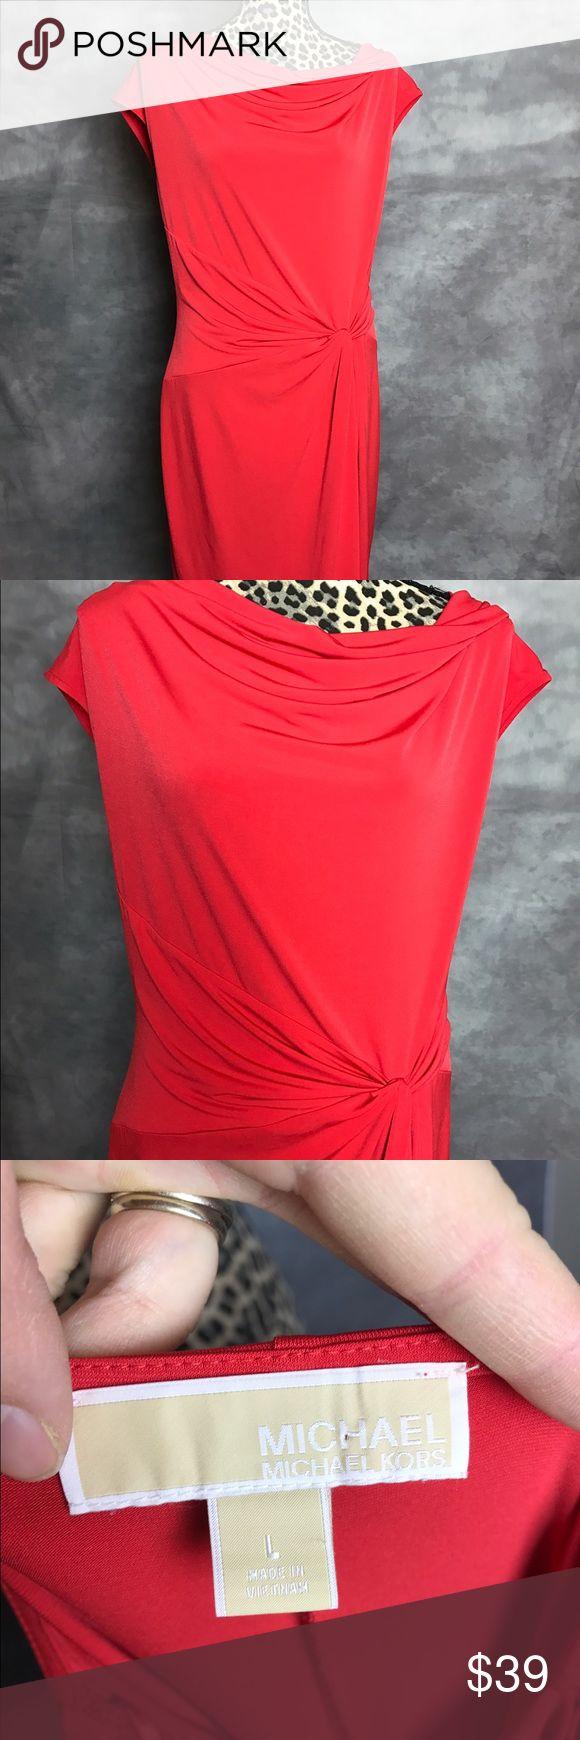 Michael Kors Woman Dress Sheath Sz L Red Great used condition knee length MICHAEL Michael Kors Dresses Mini